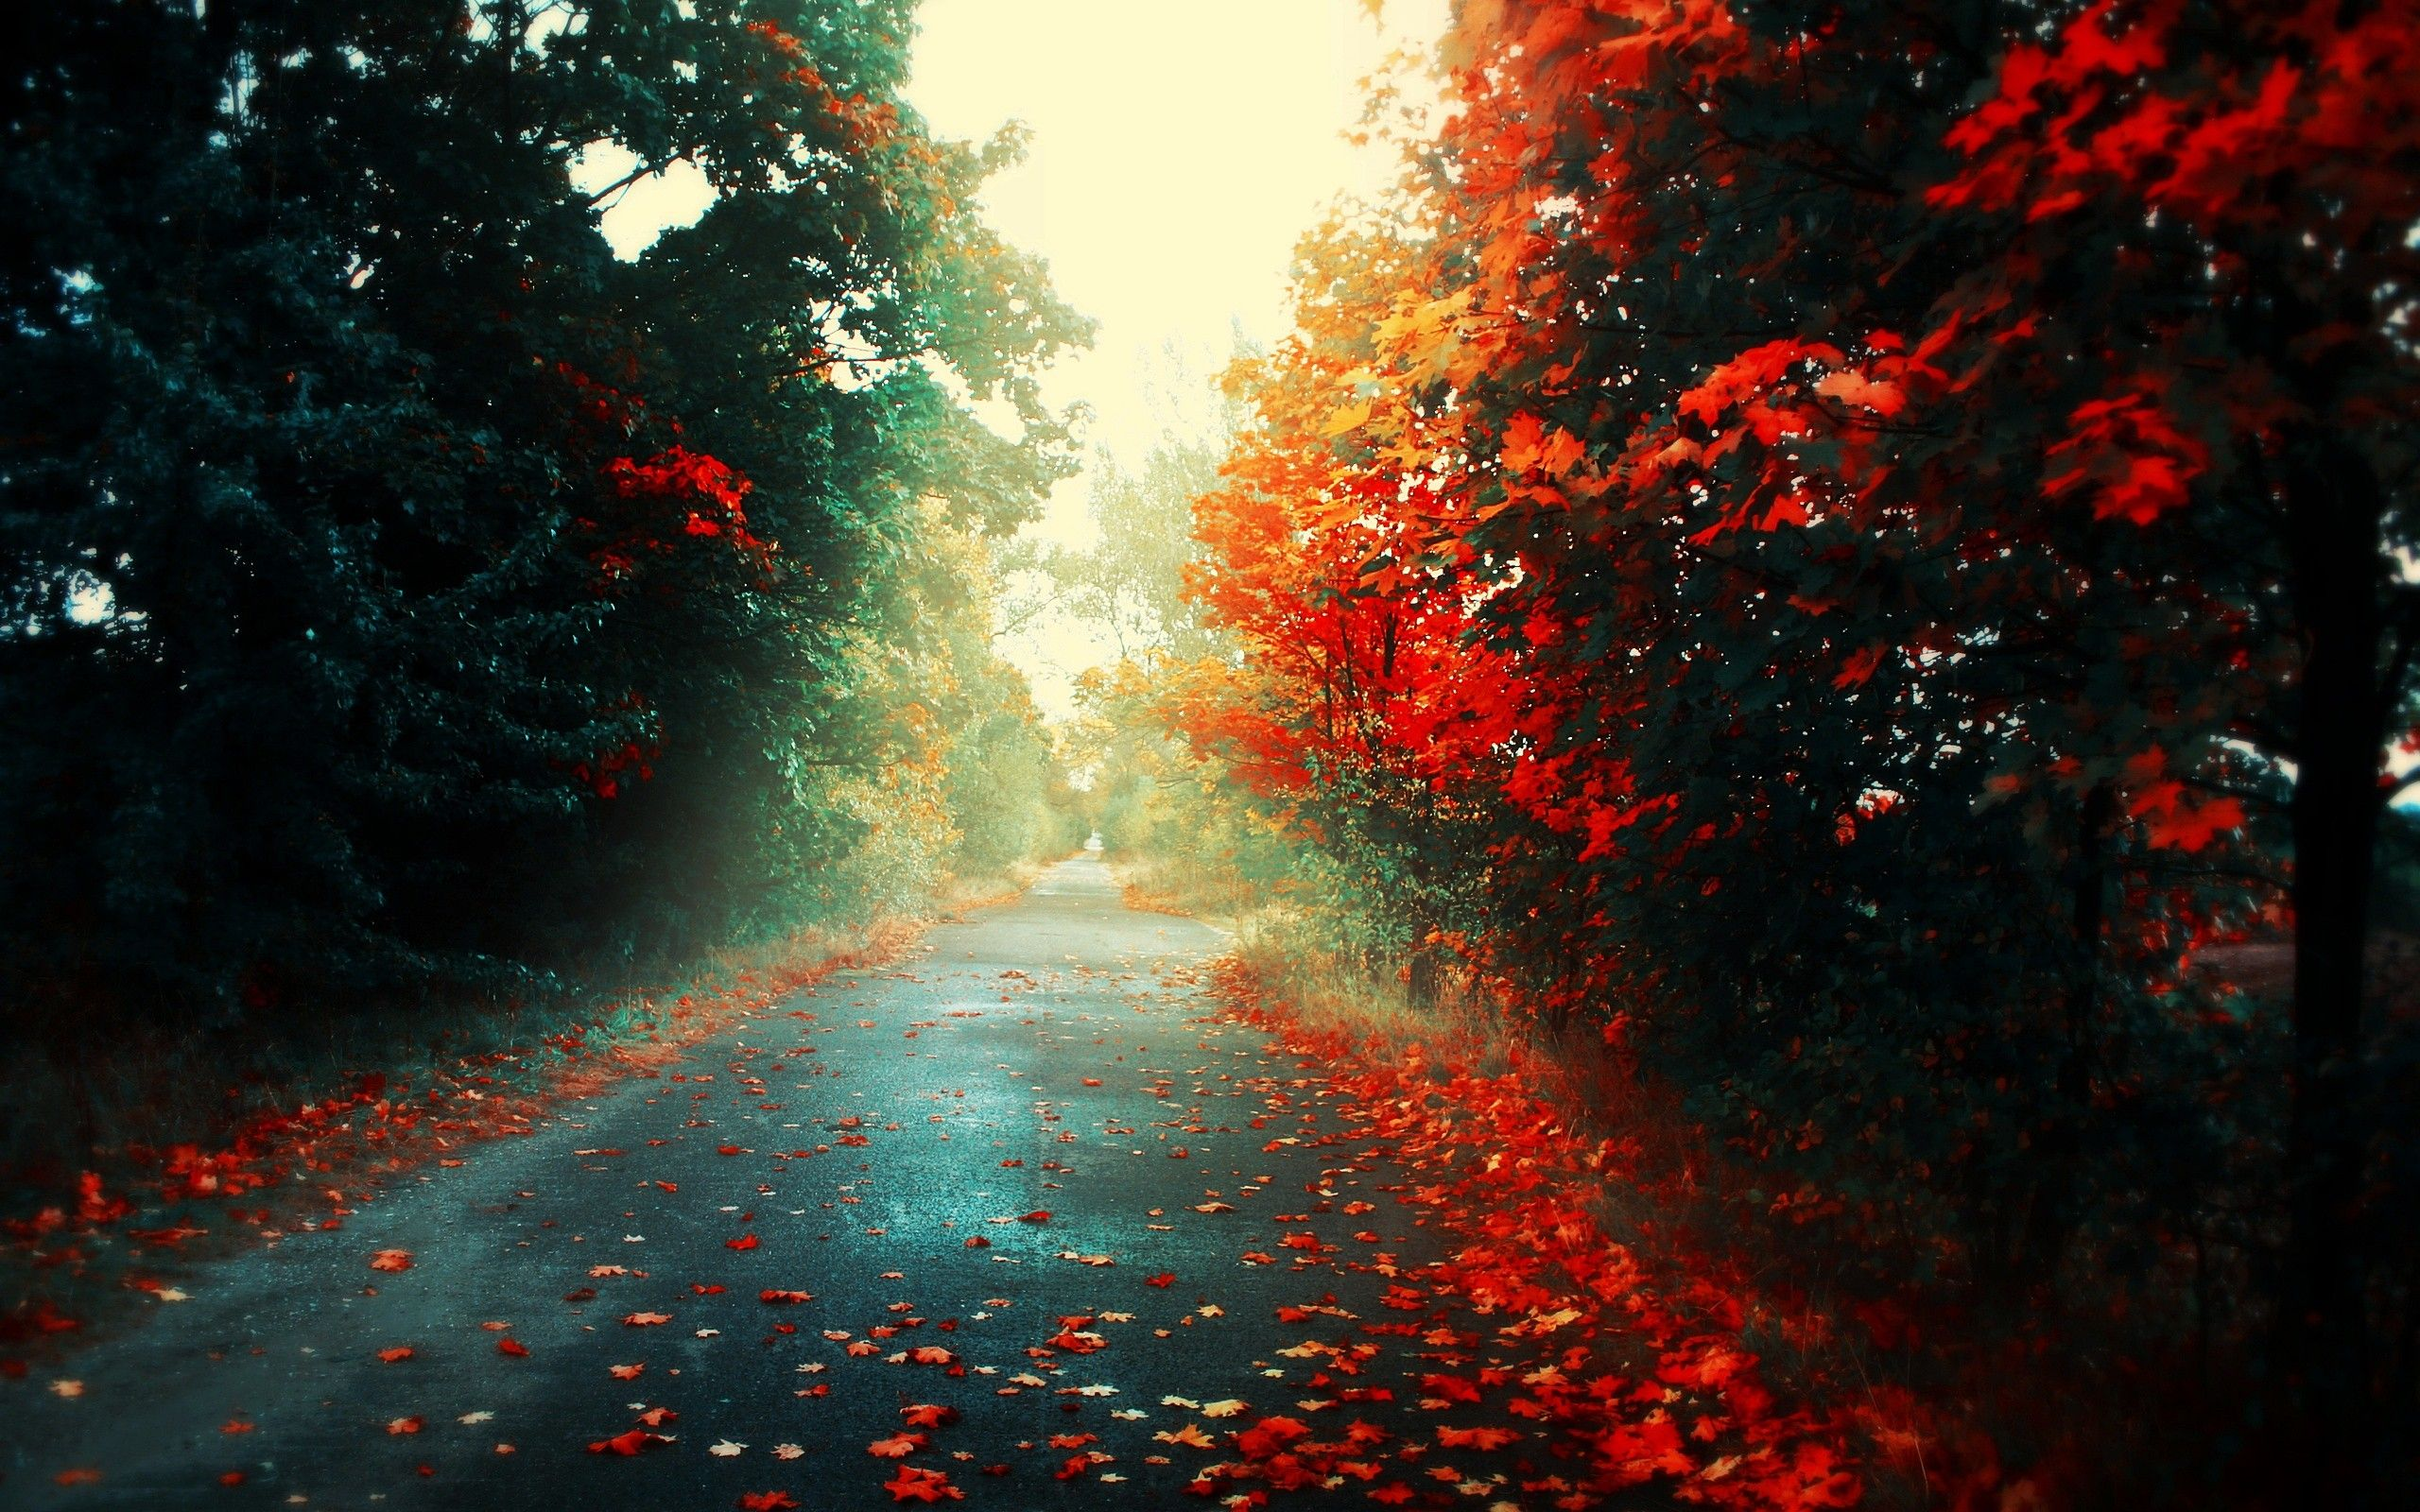 Landscapes Trees Autumn Season Leaves Roads Fallen